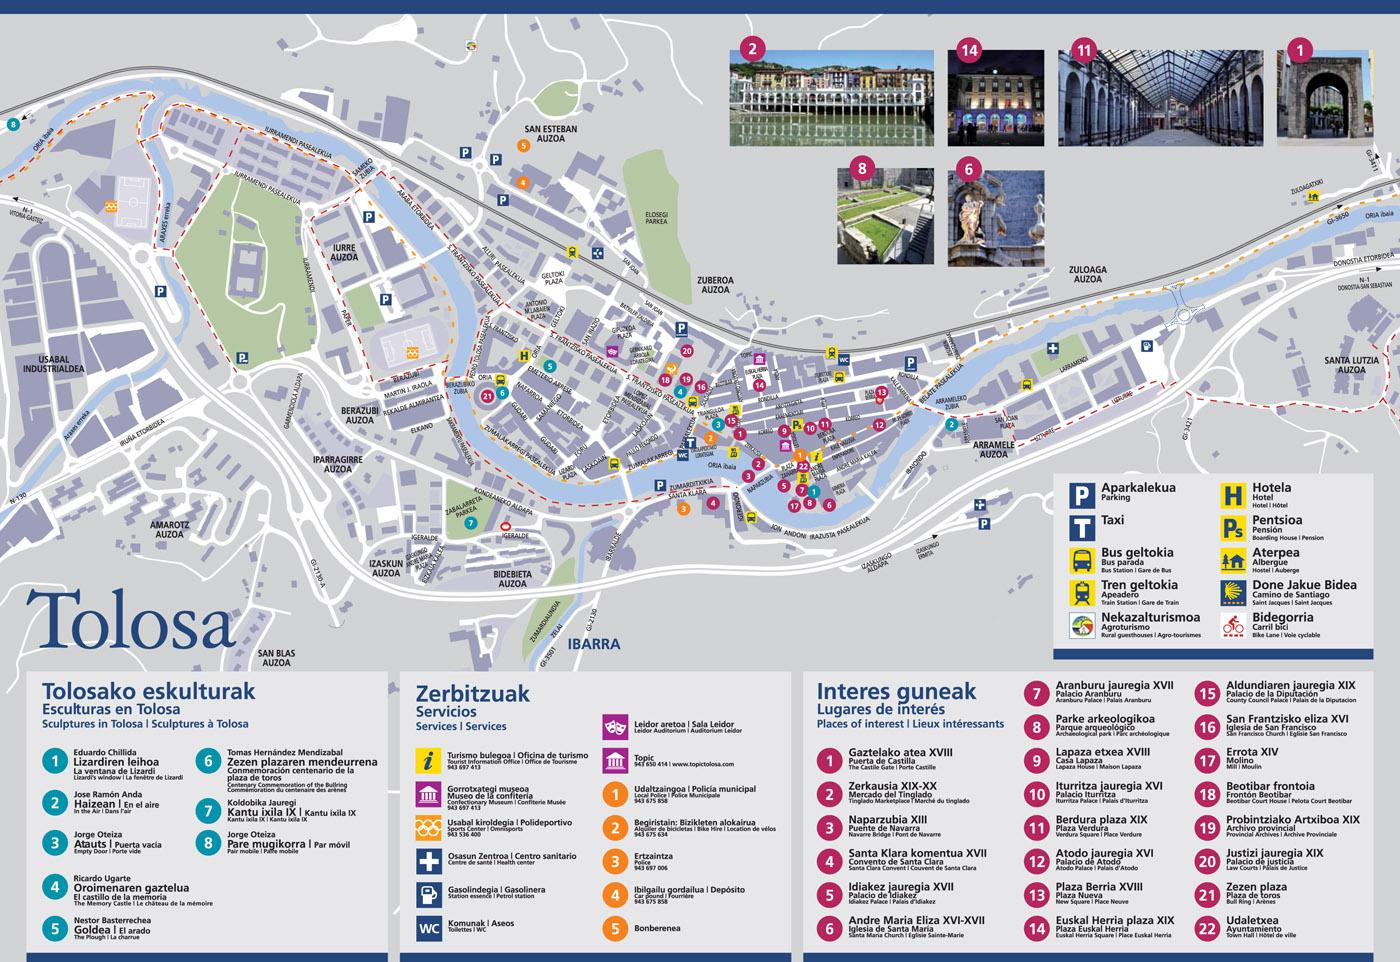 Map of Tolosa courtesy of Tolosatours.